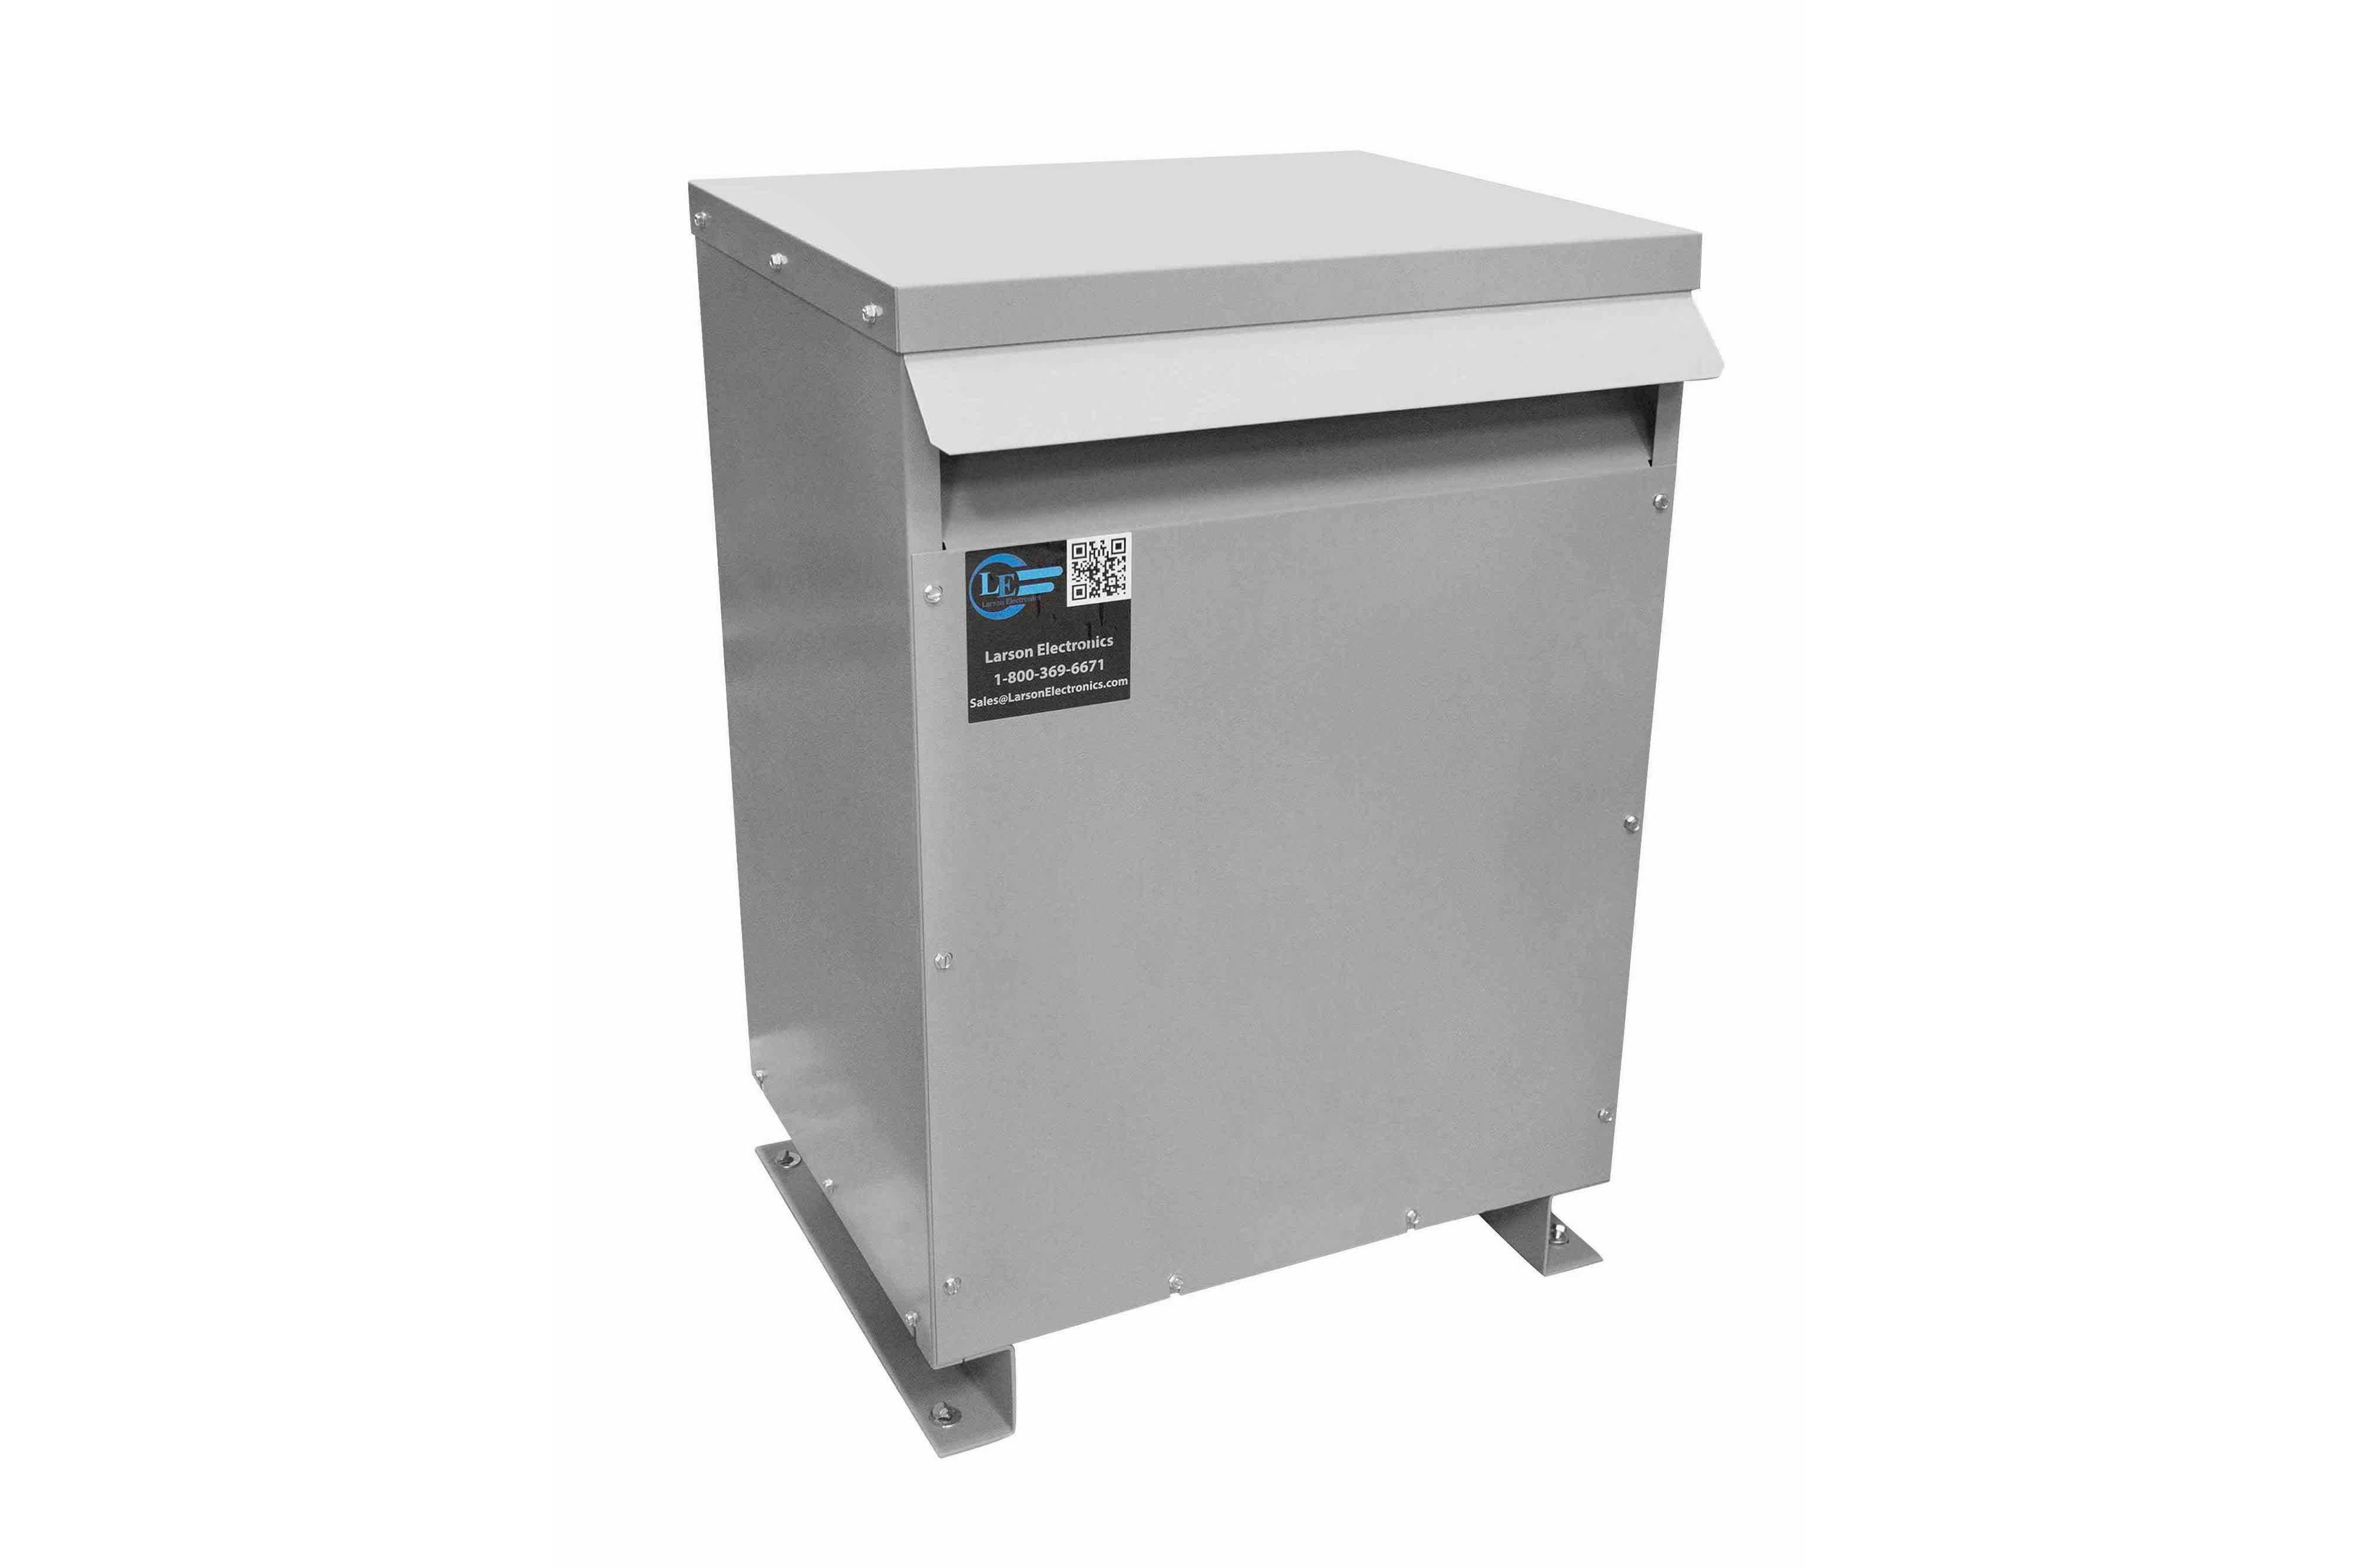 90 kVA 3PH Isolation Transformer, 208V Wye Primary, 240V/120 Delta Secondary, N3R, Ventilated, 60 Hz